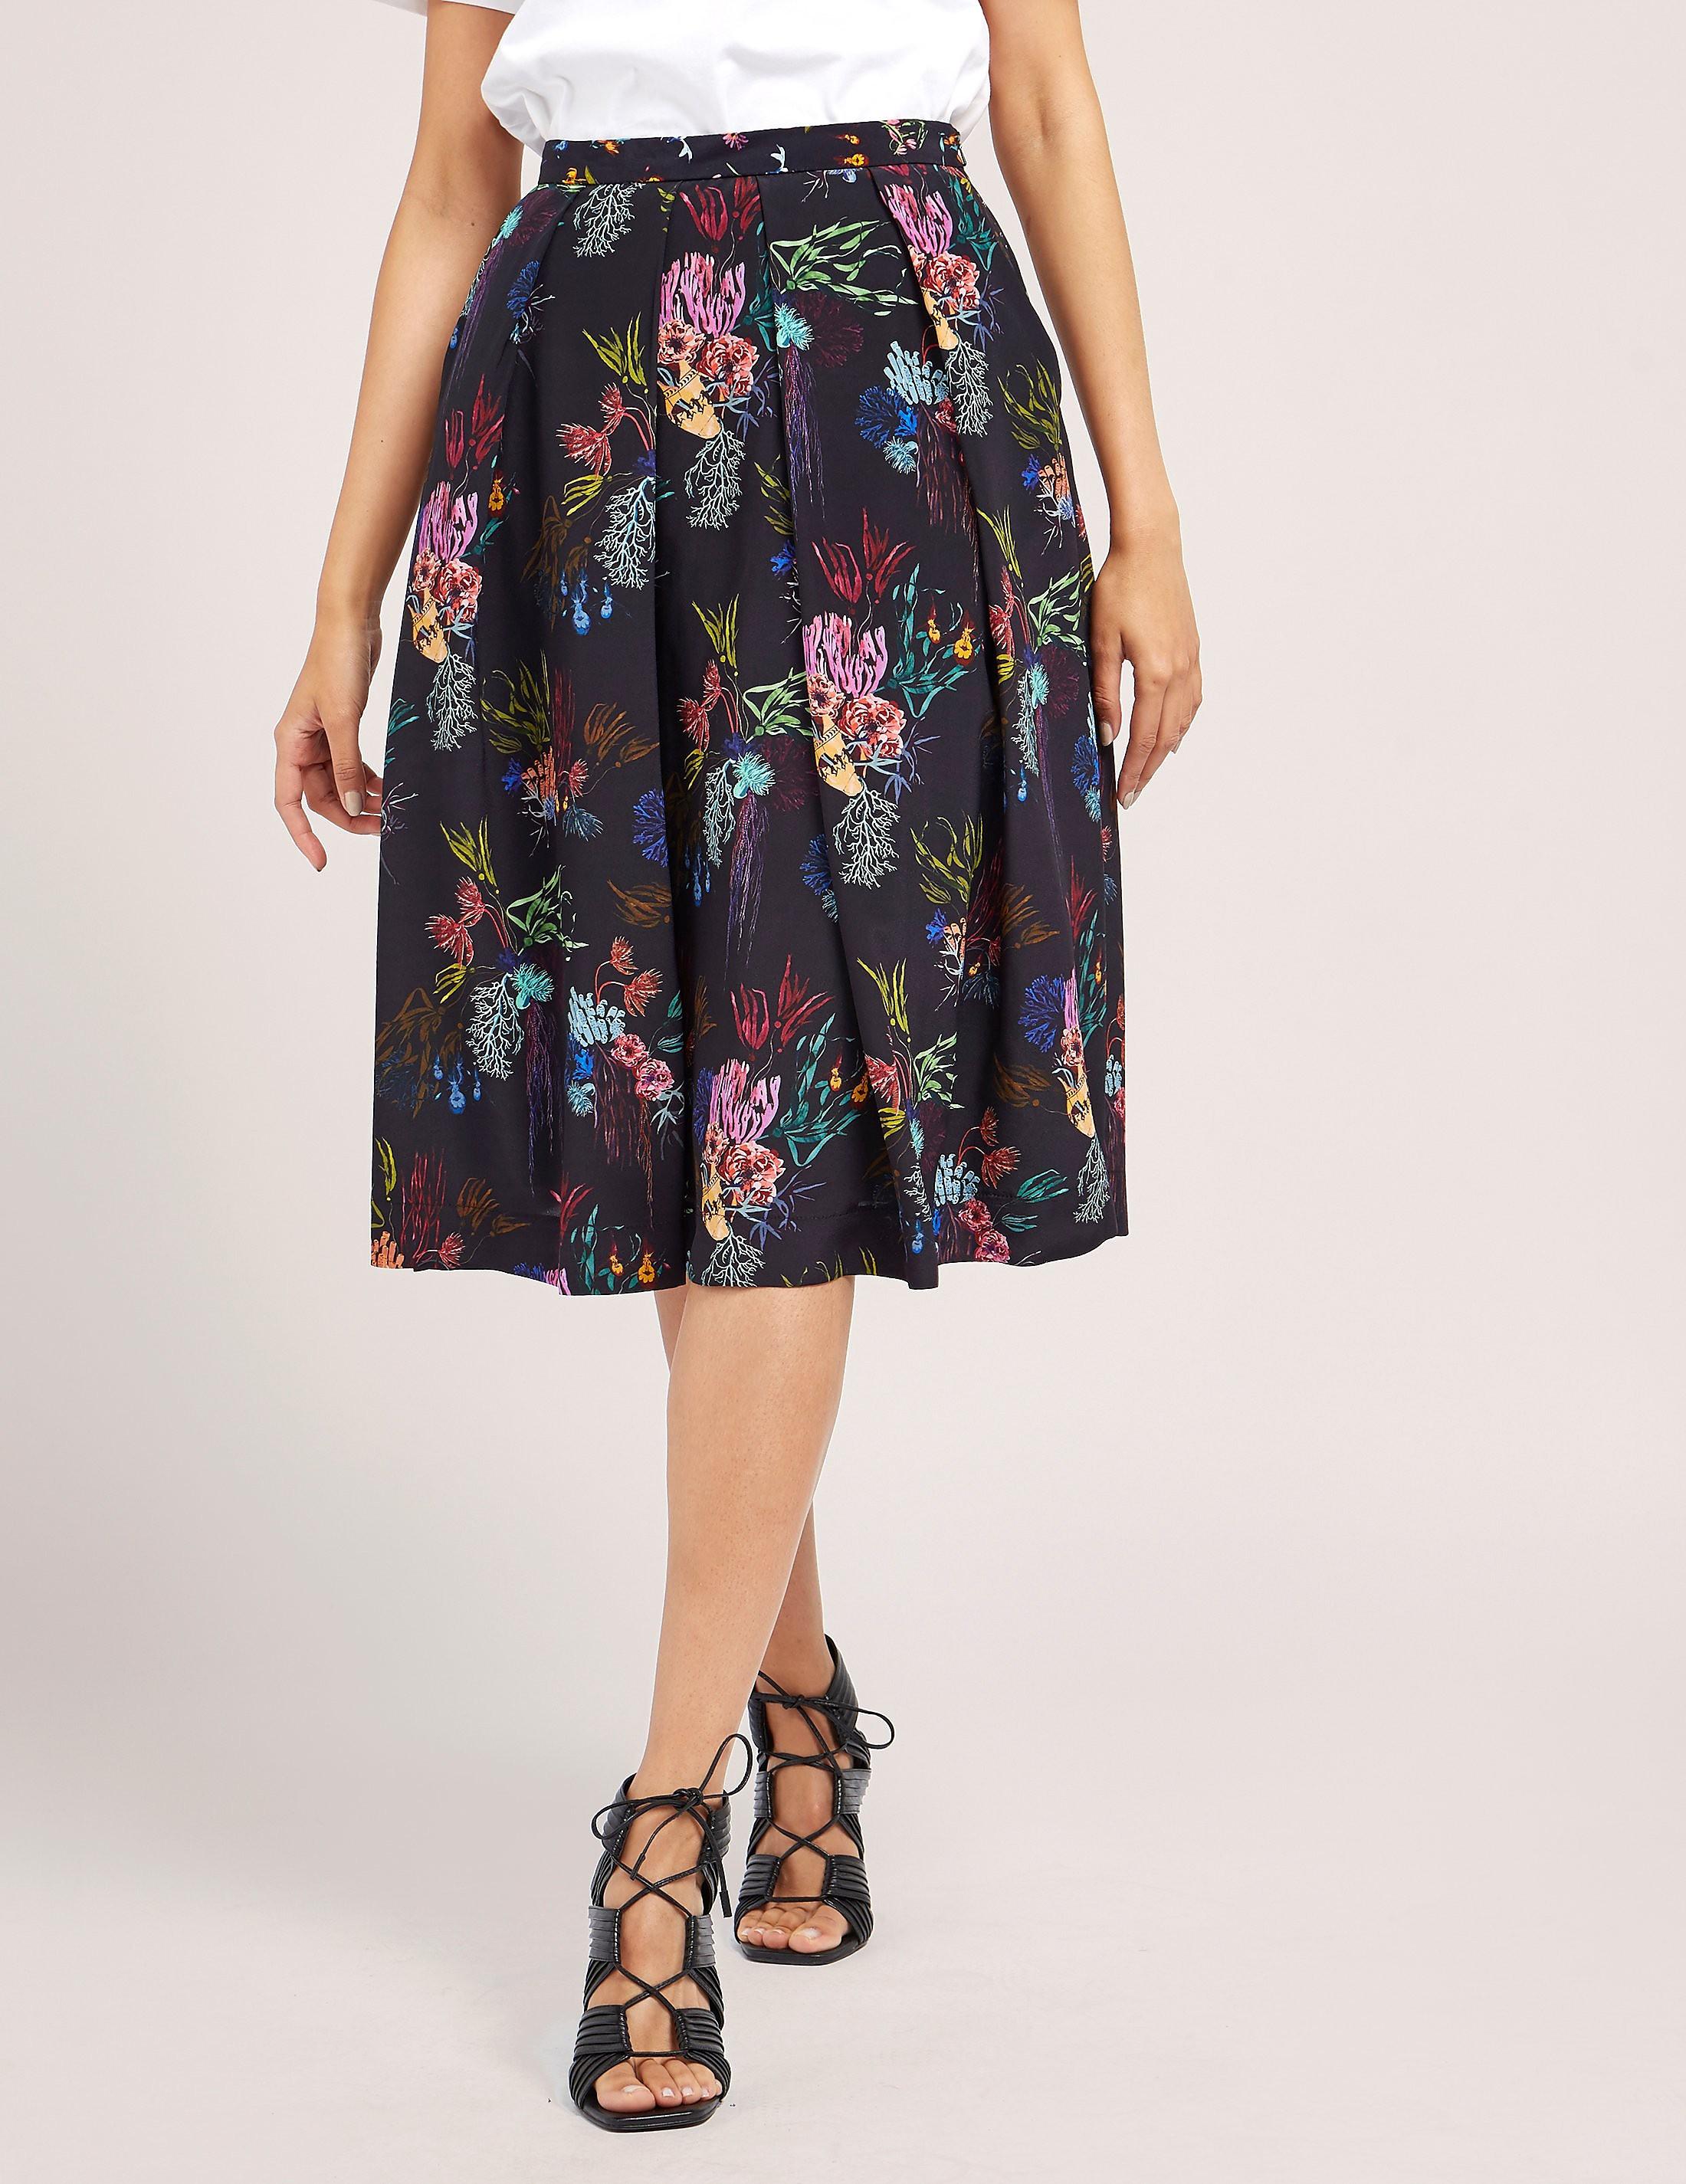 Paul Smith Coral Print Skirt